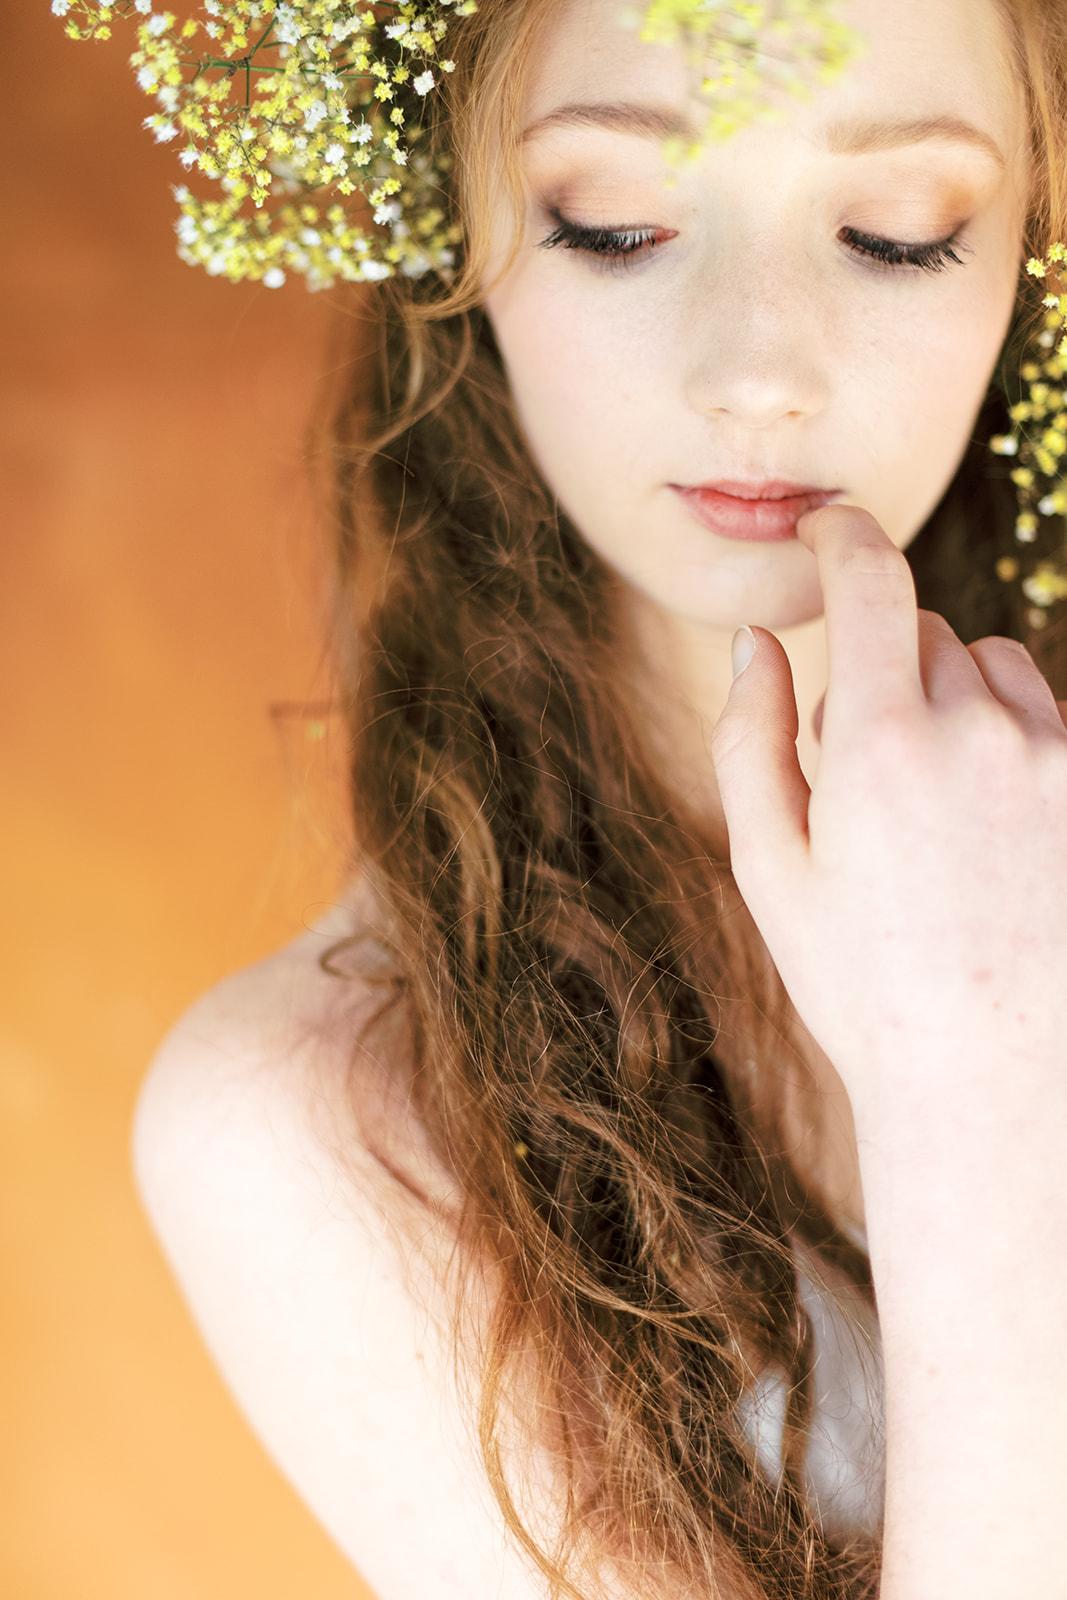 sandra-chau-stylist-fine-art-editorial-shoot-wedding-inspiration-yellowflowers-flowercrown-unearthingtc-1.jpg